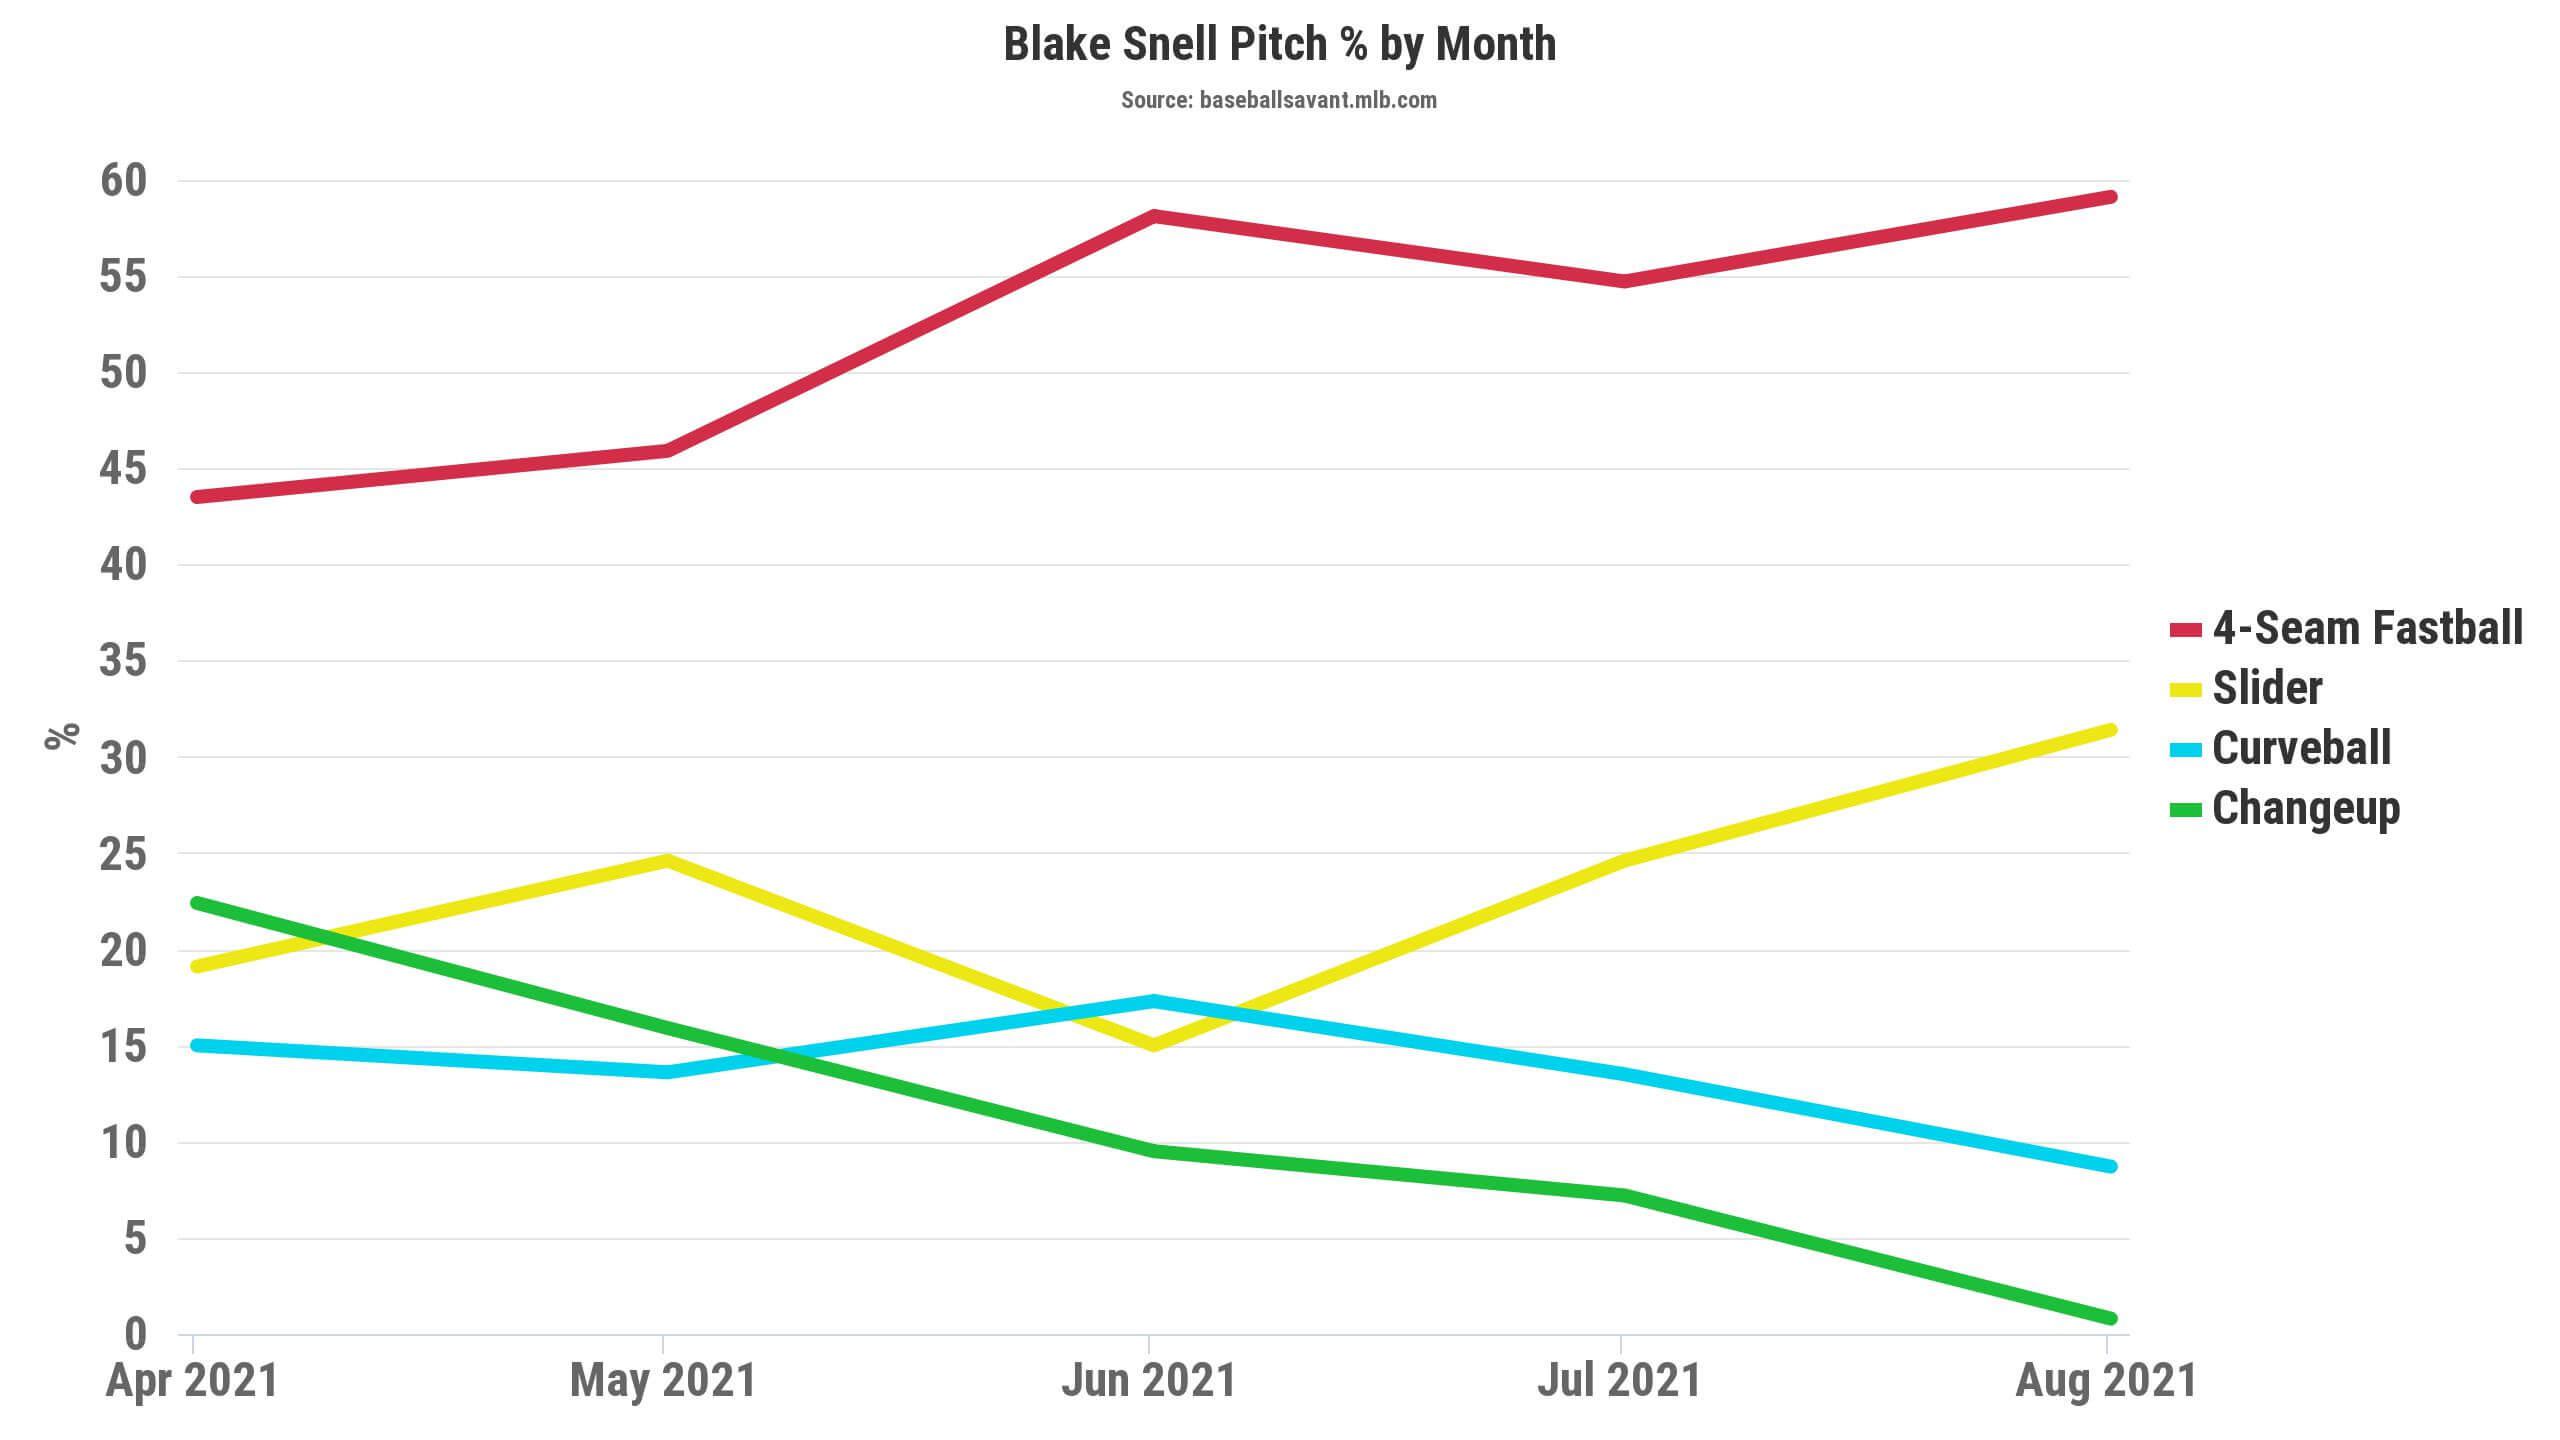 Blake Snell Pitch Mix